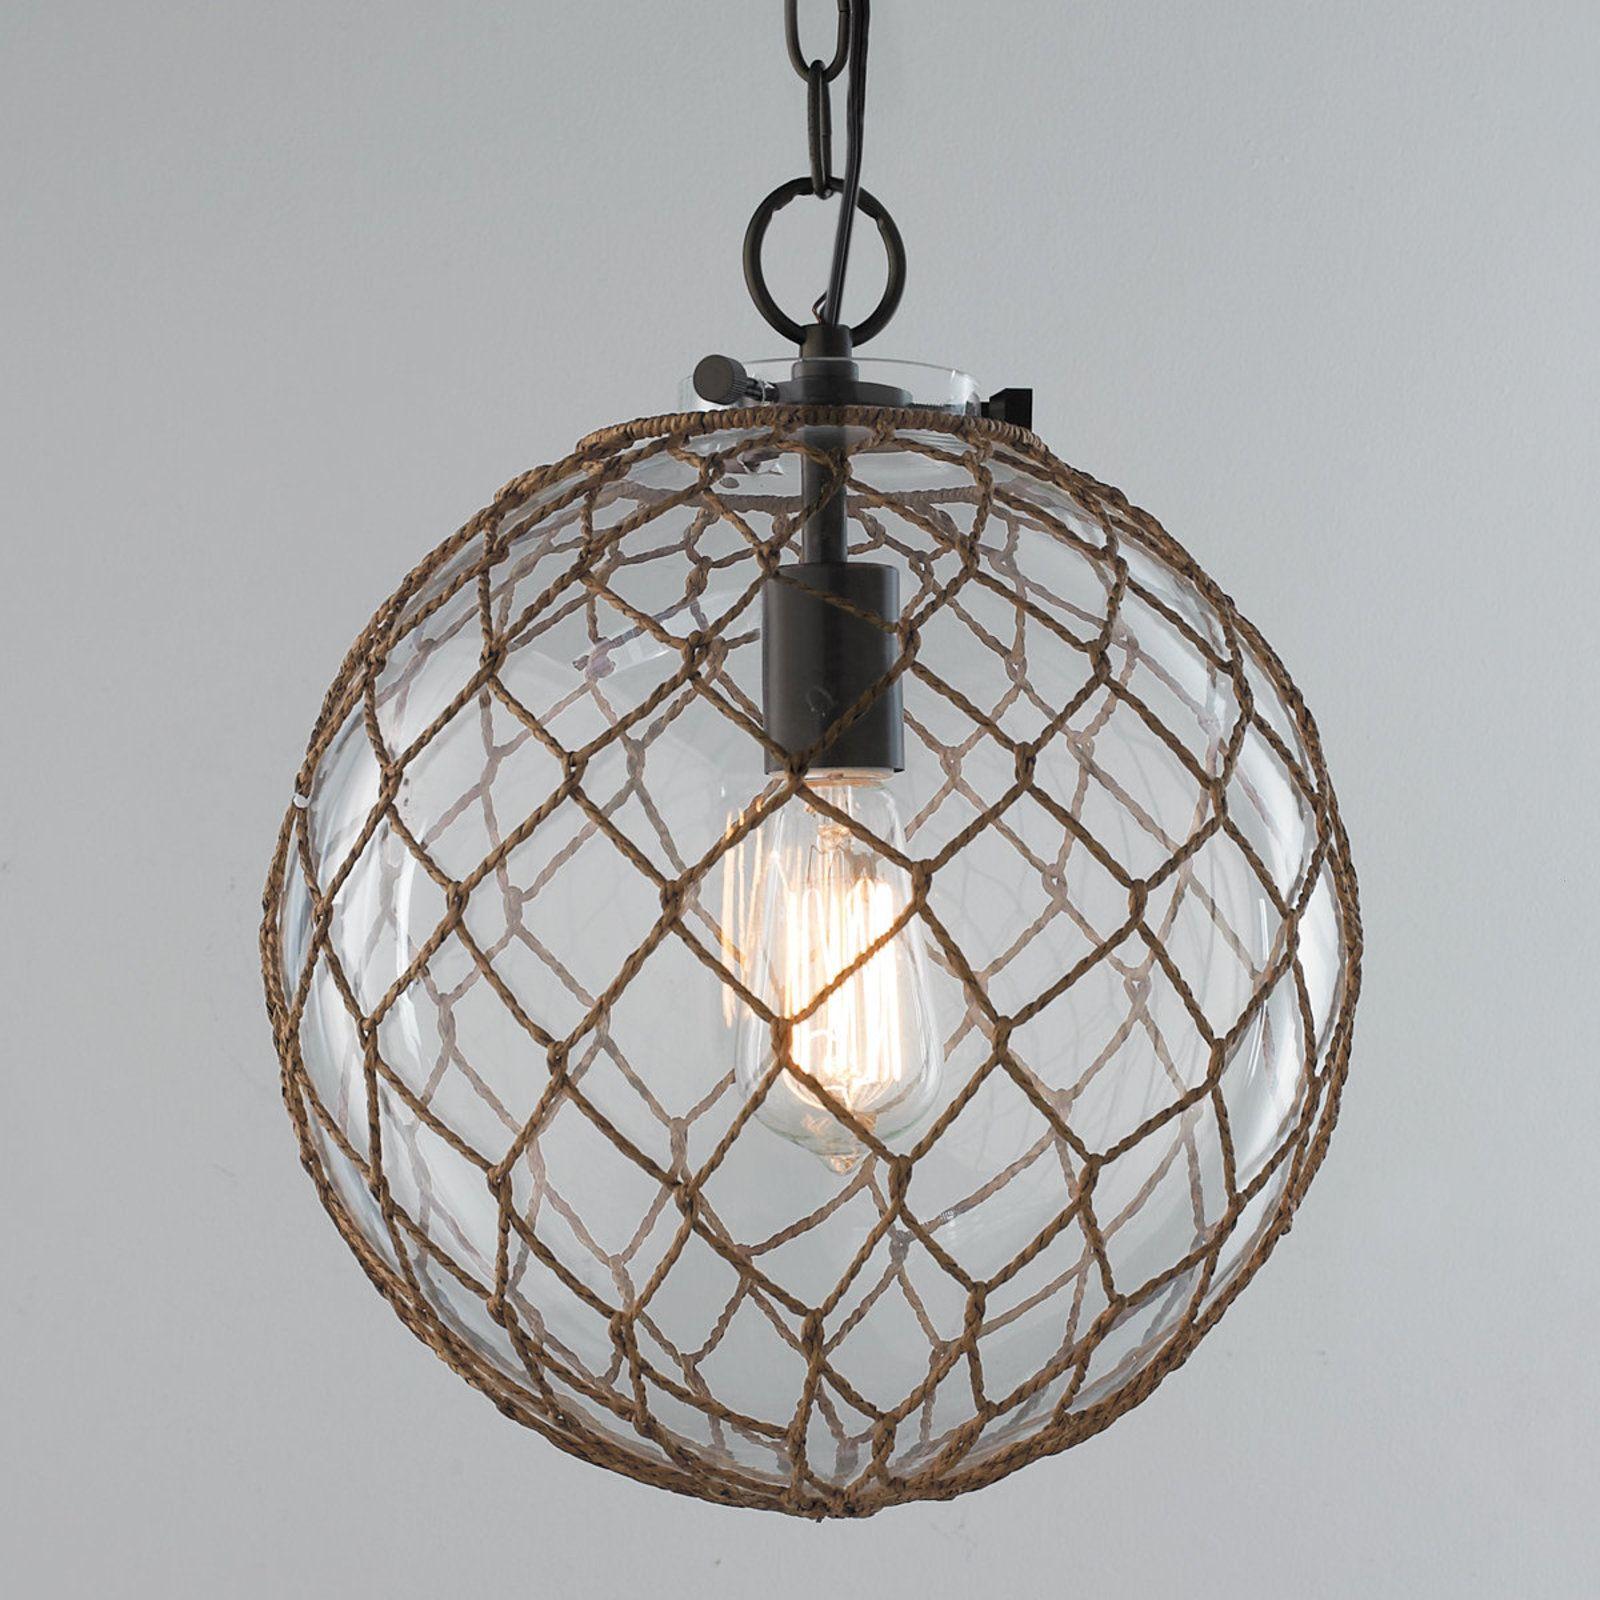 Jute rope globe pendant nautical rope beach cottages and lights jute rope globe pendant arubaitofo Images